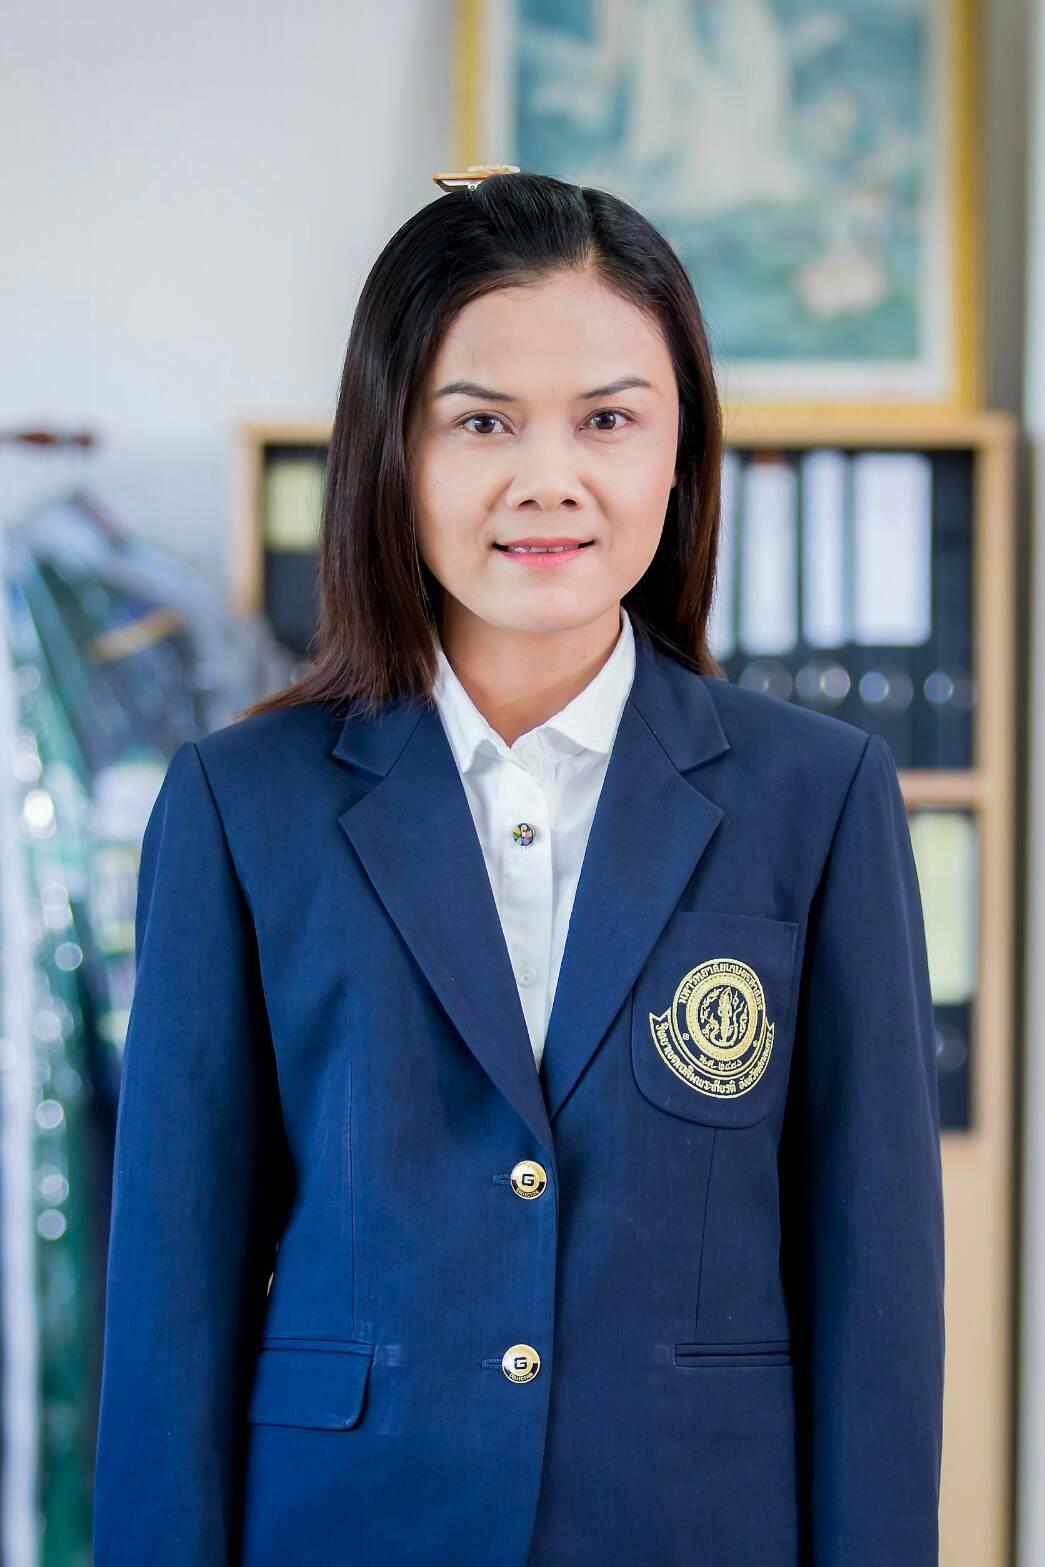 Personnel Photo